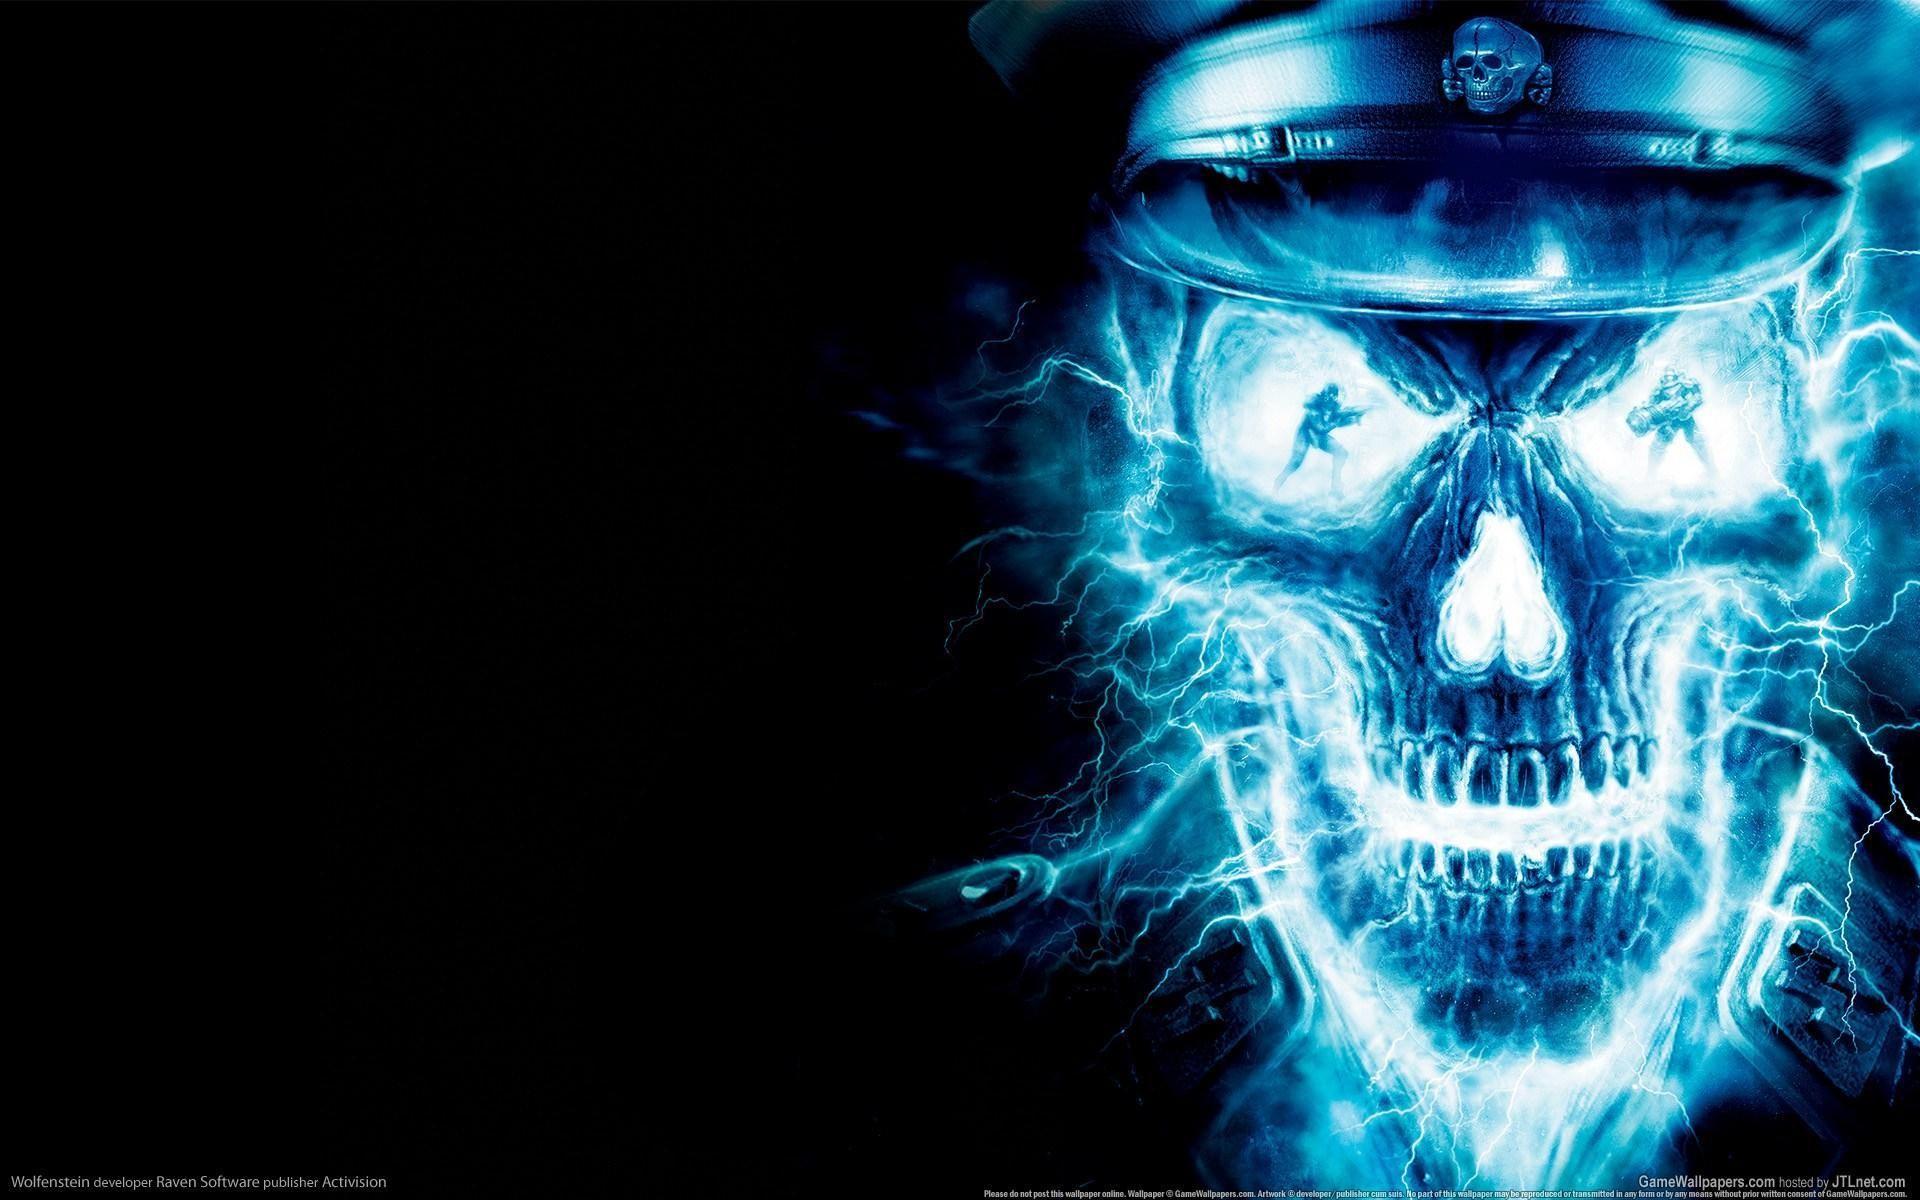 Desktophdwallpaper Org Ghost Rider Wallpaper Skull Wallpaper Hd Skull Wallpapers Gaming pc wallpaper wonderful hd